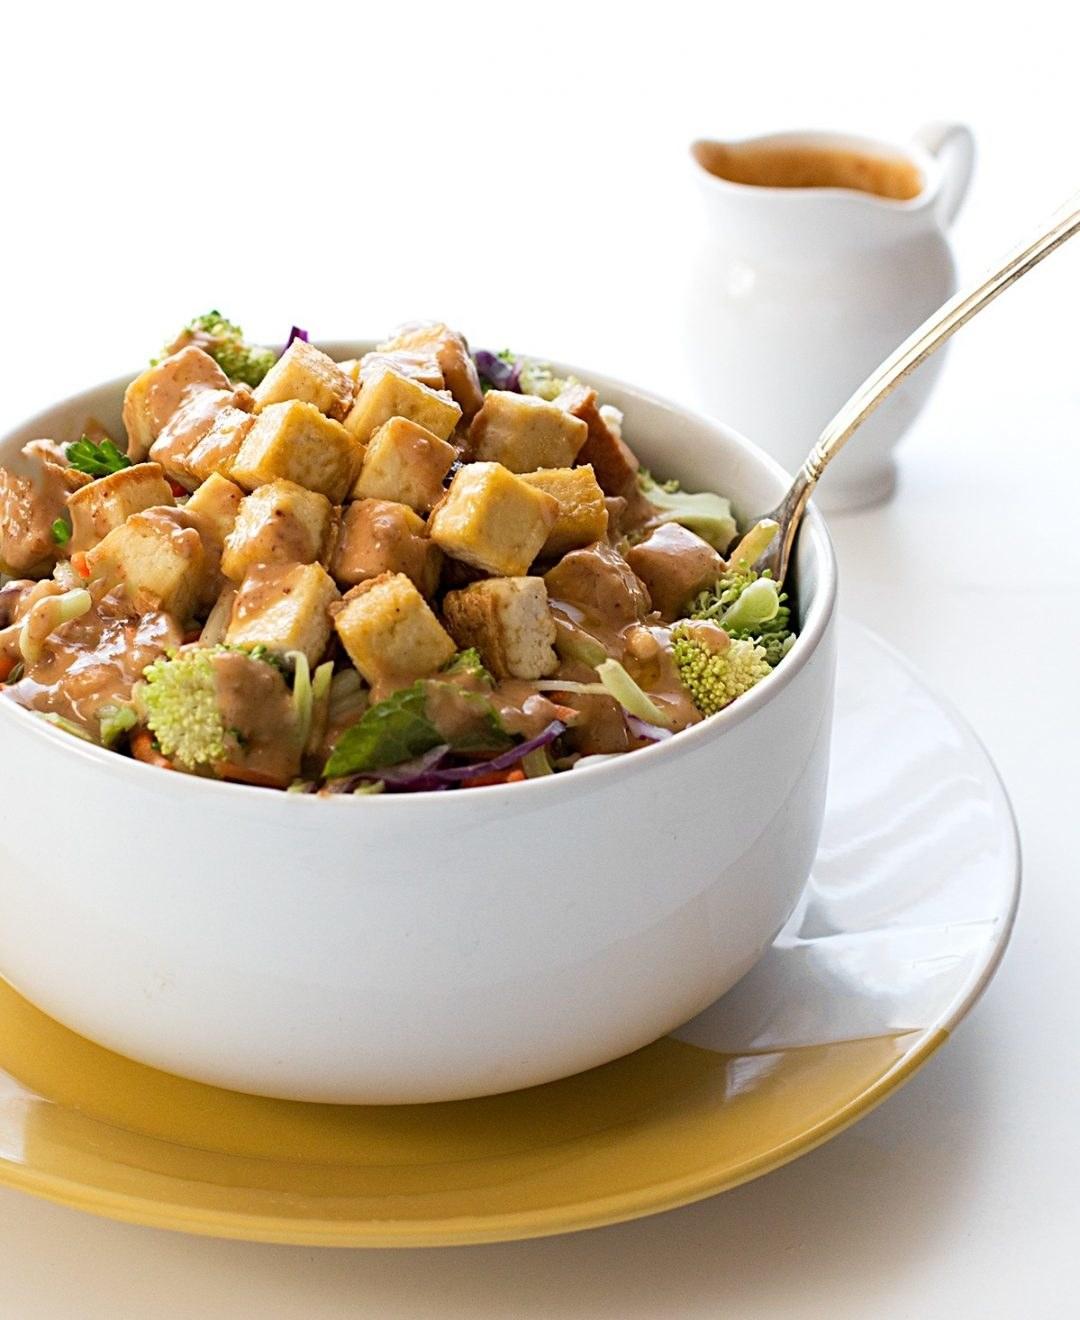 12 Addictive Salad Dressing Recipes To Make In Bulk